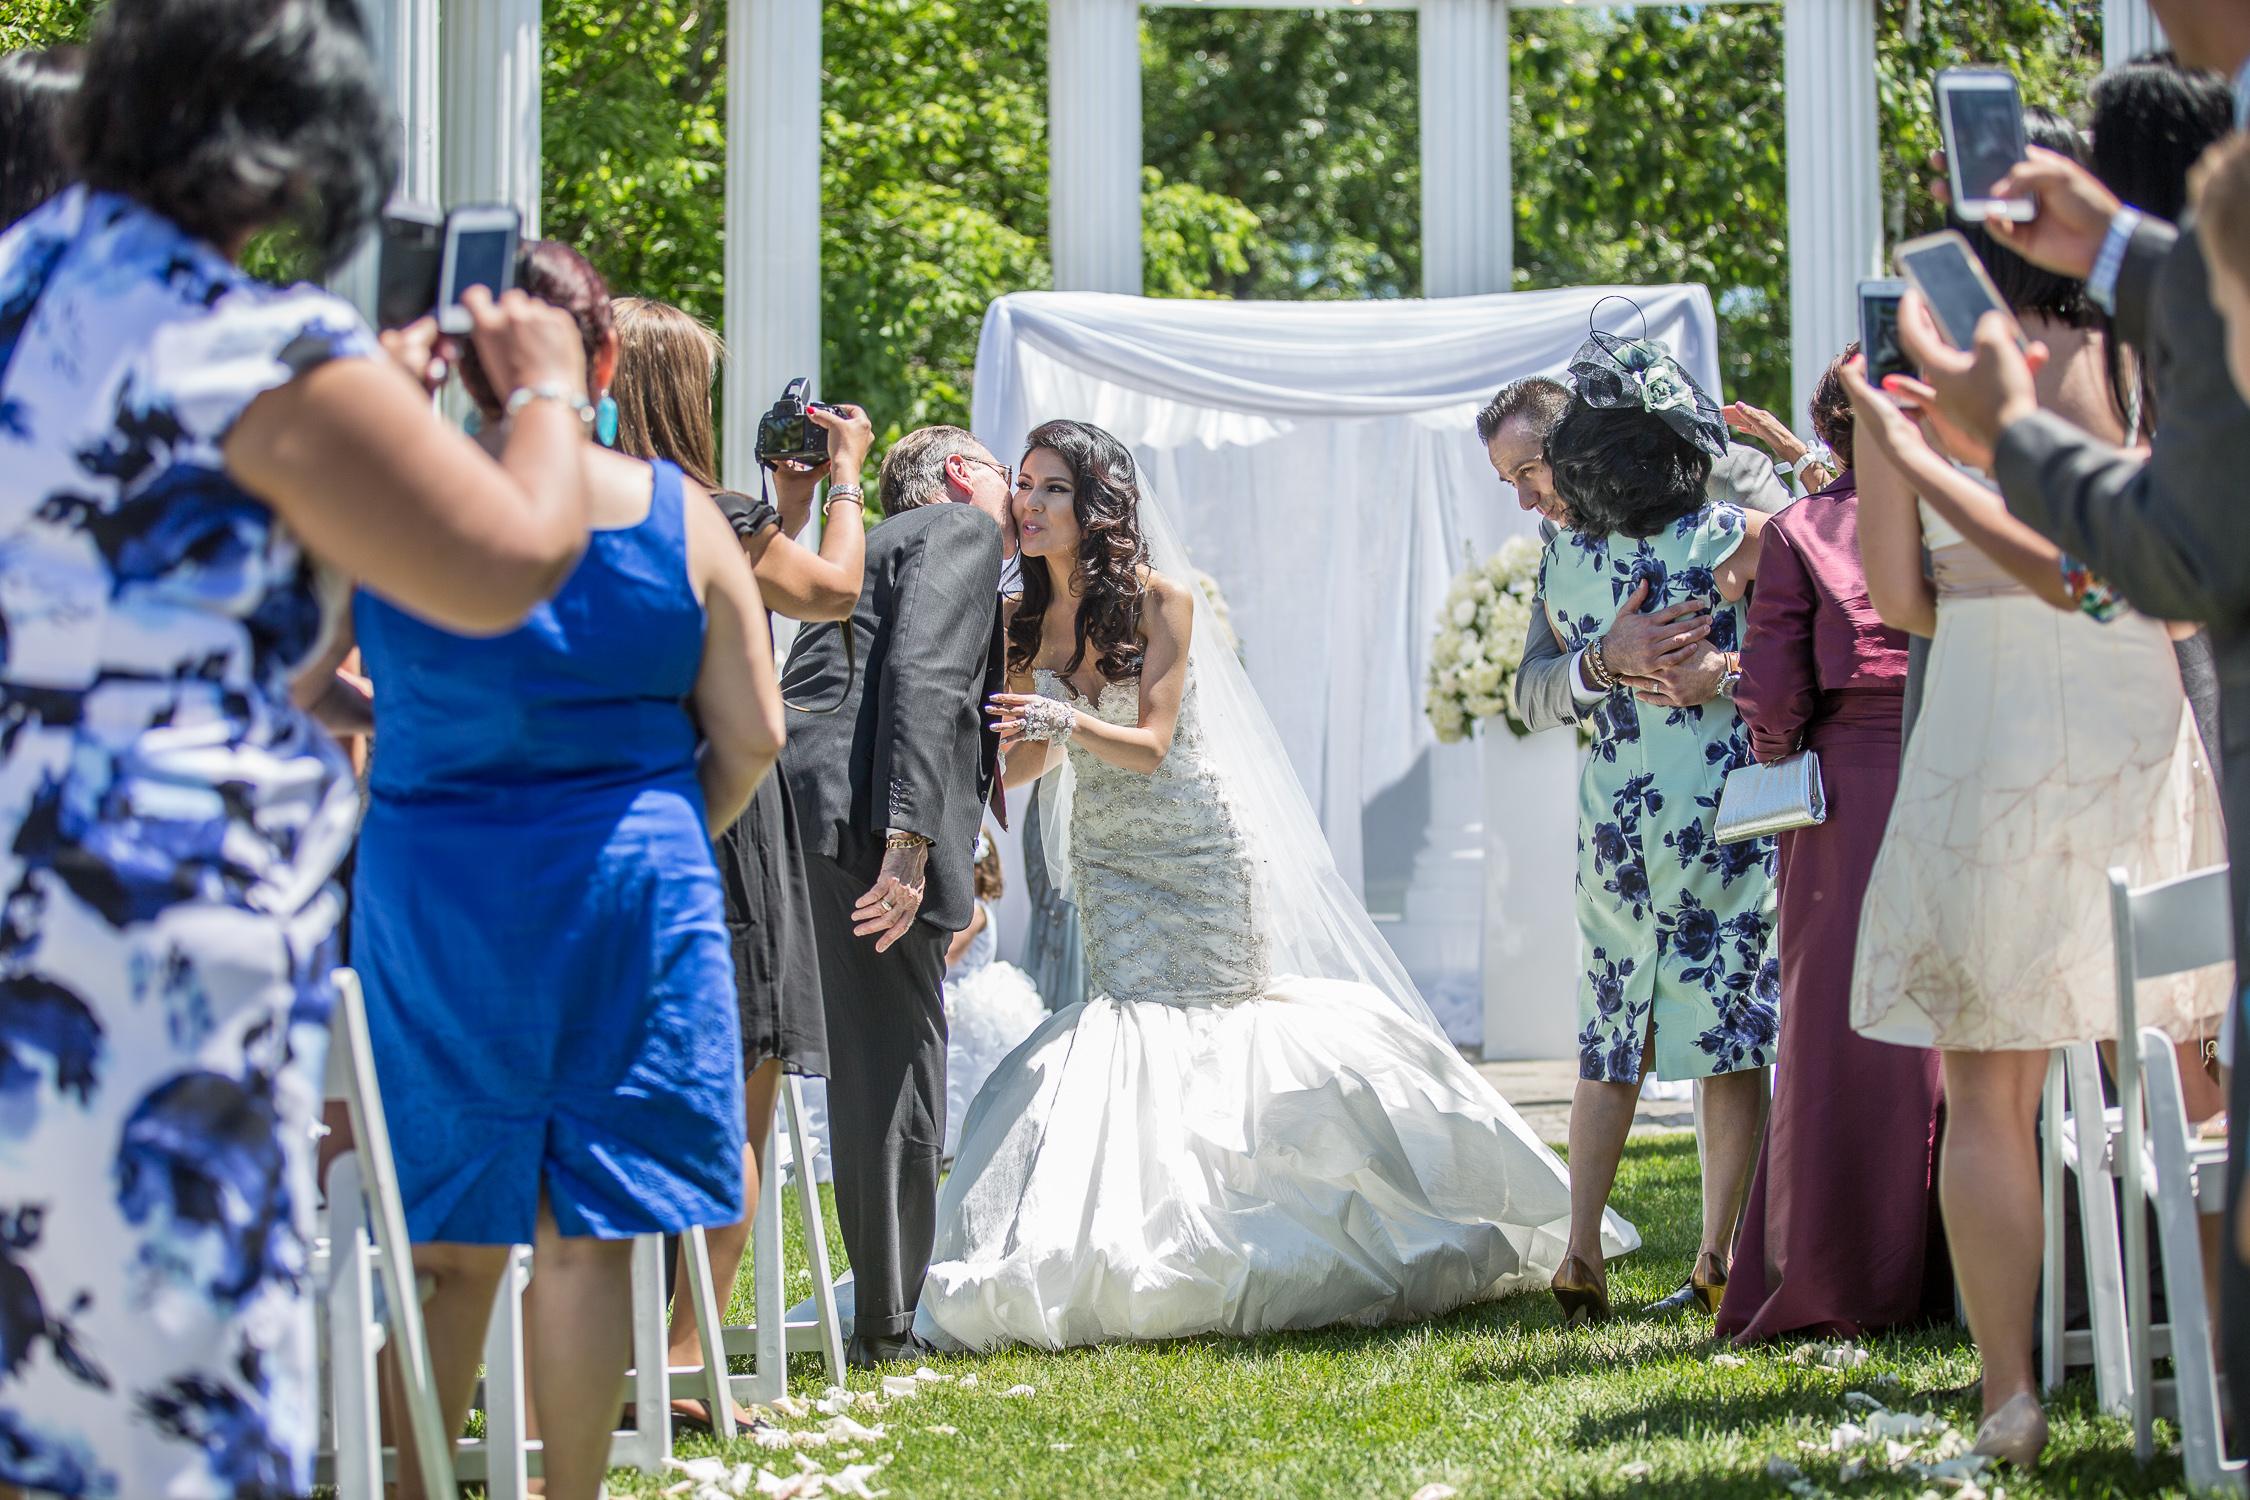 Paradise-Banquet-Hall-Wedding-Vaughan-Ontario-0051.jpg